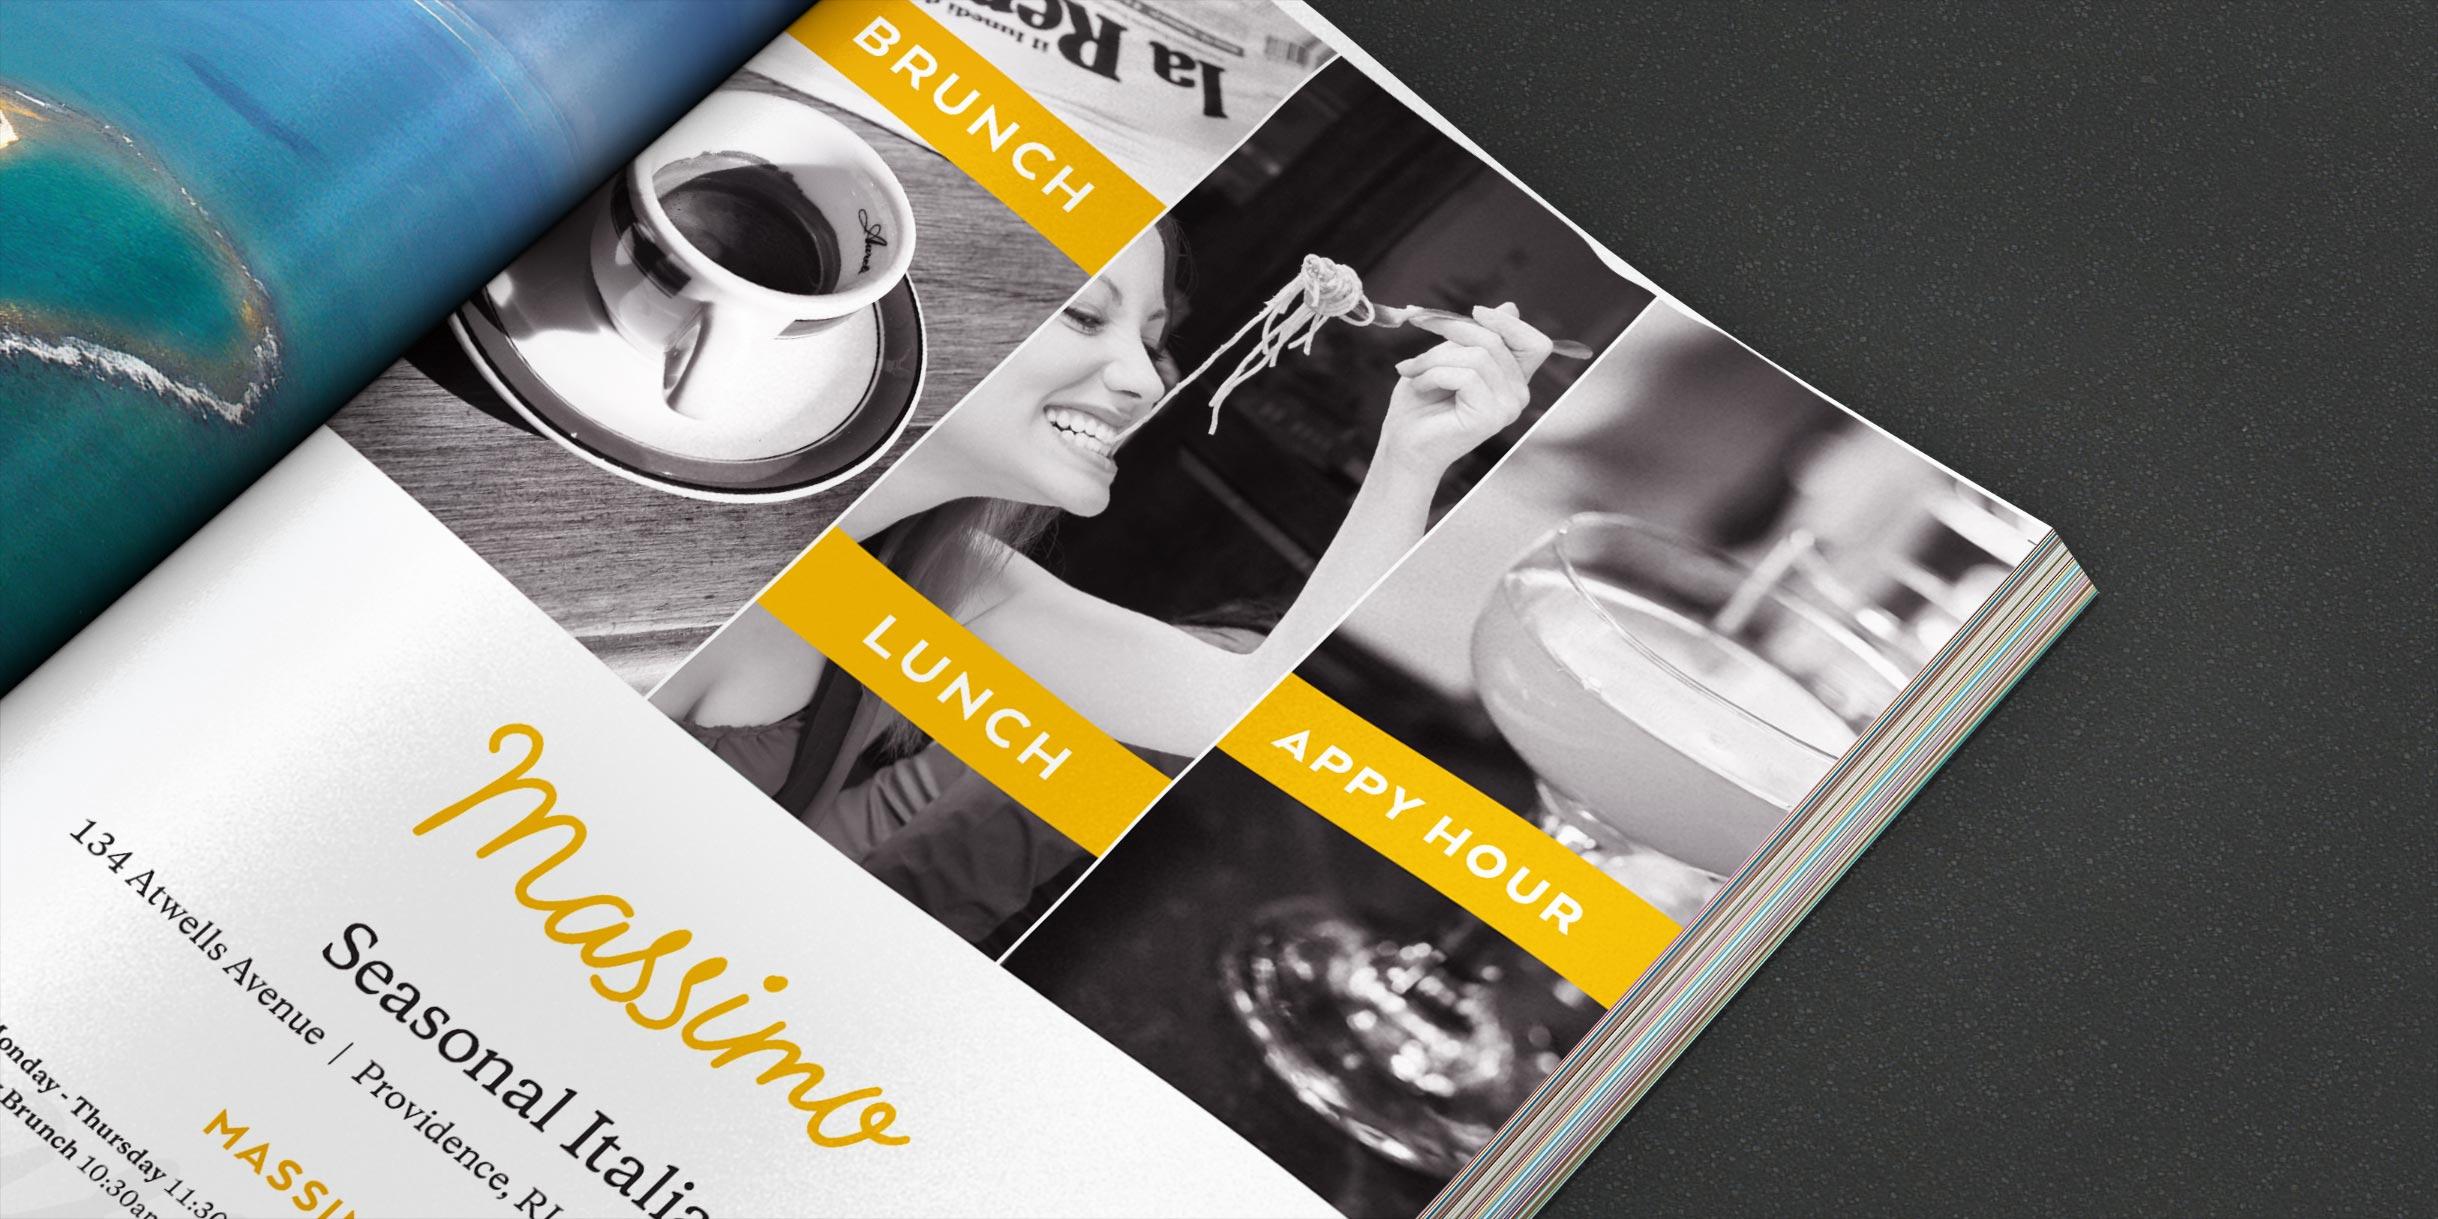 Restaurant logo, branding, advertisement, signage and web design